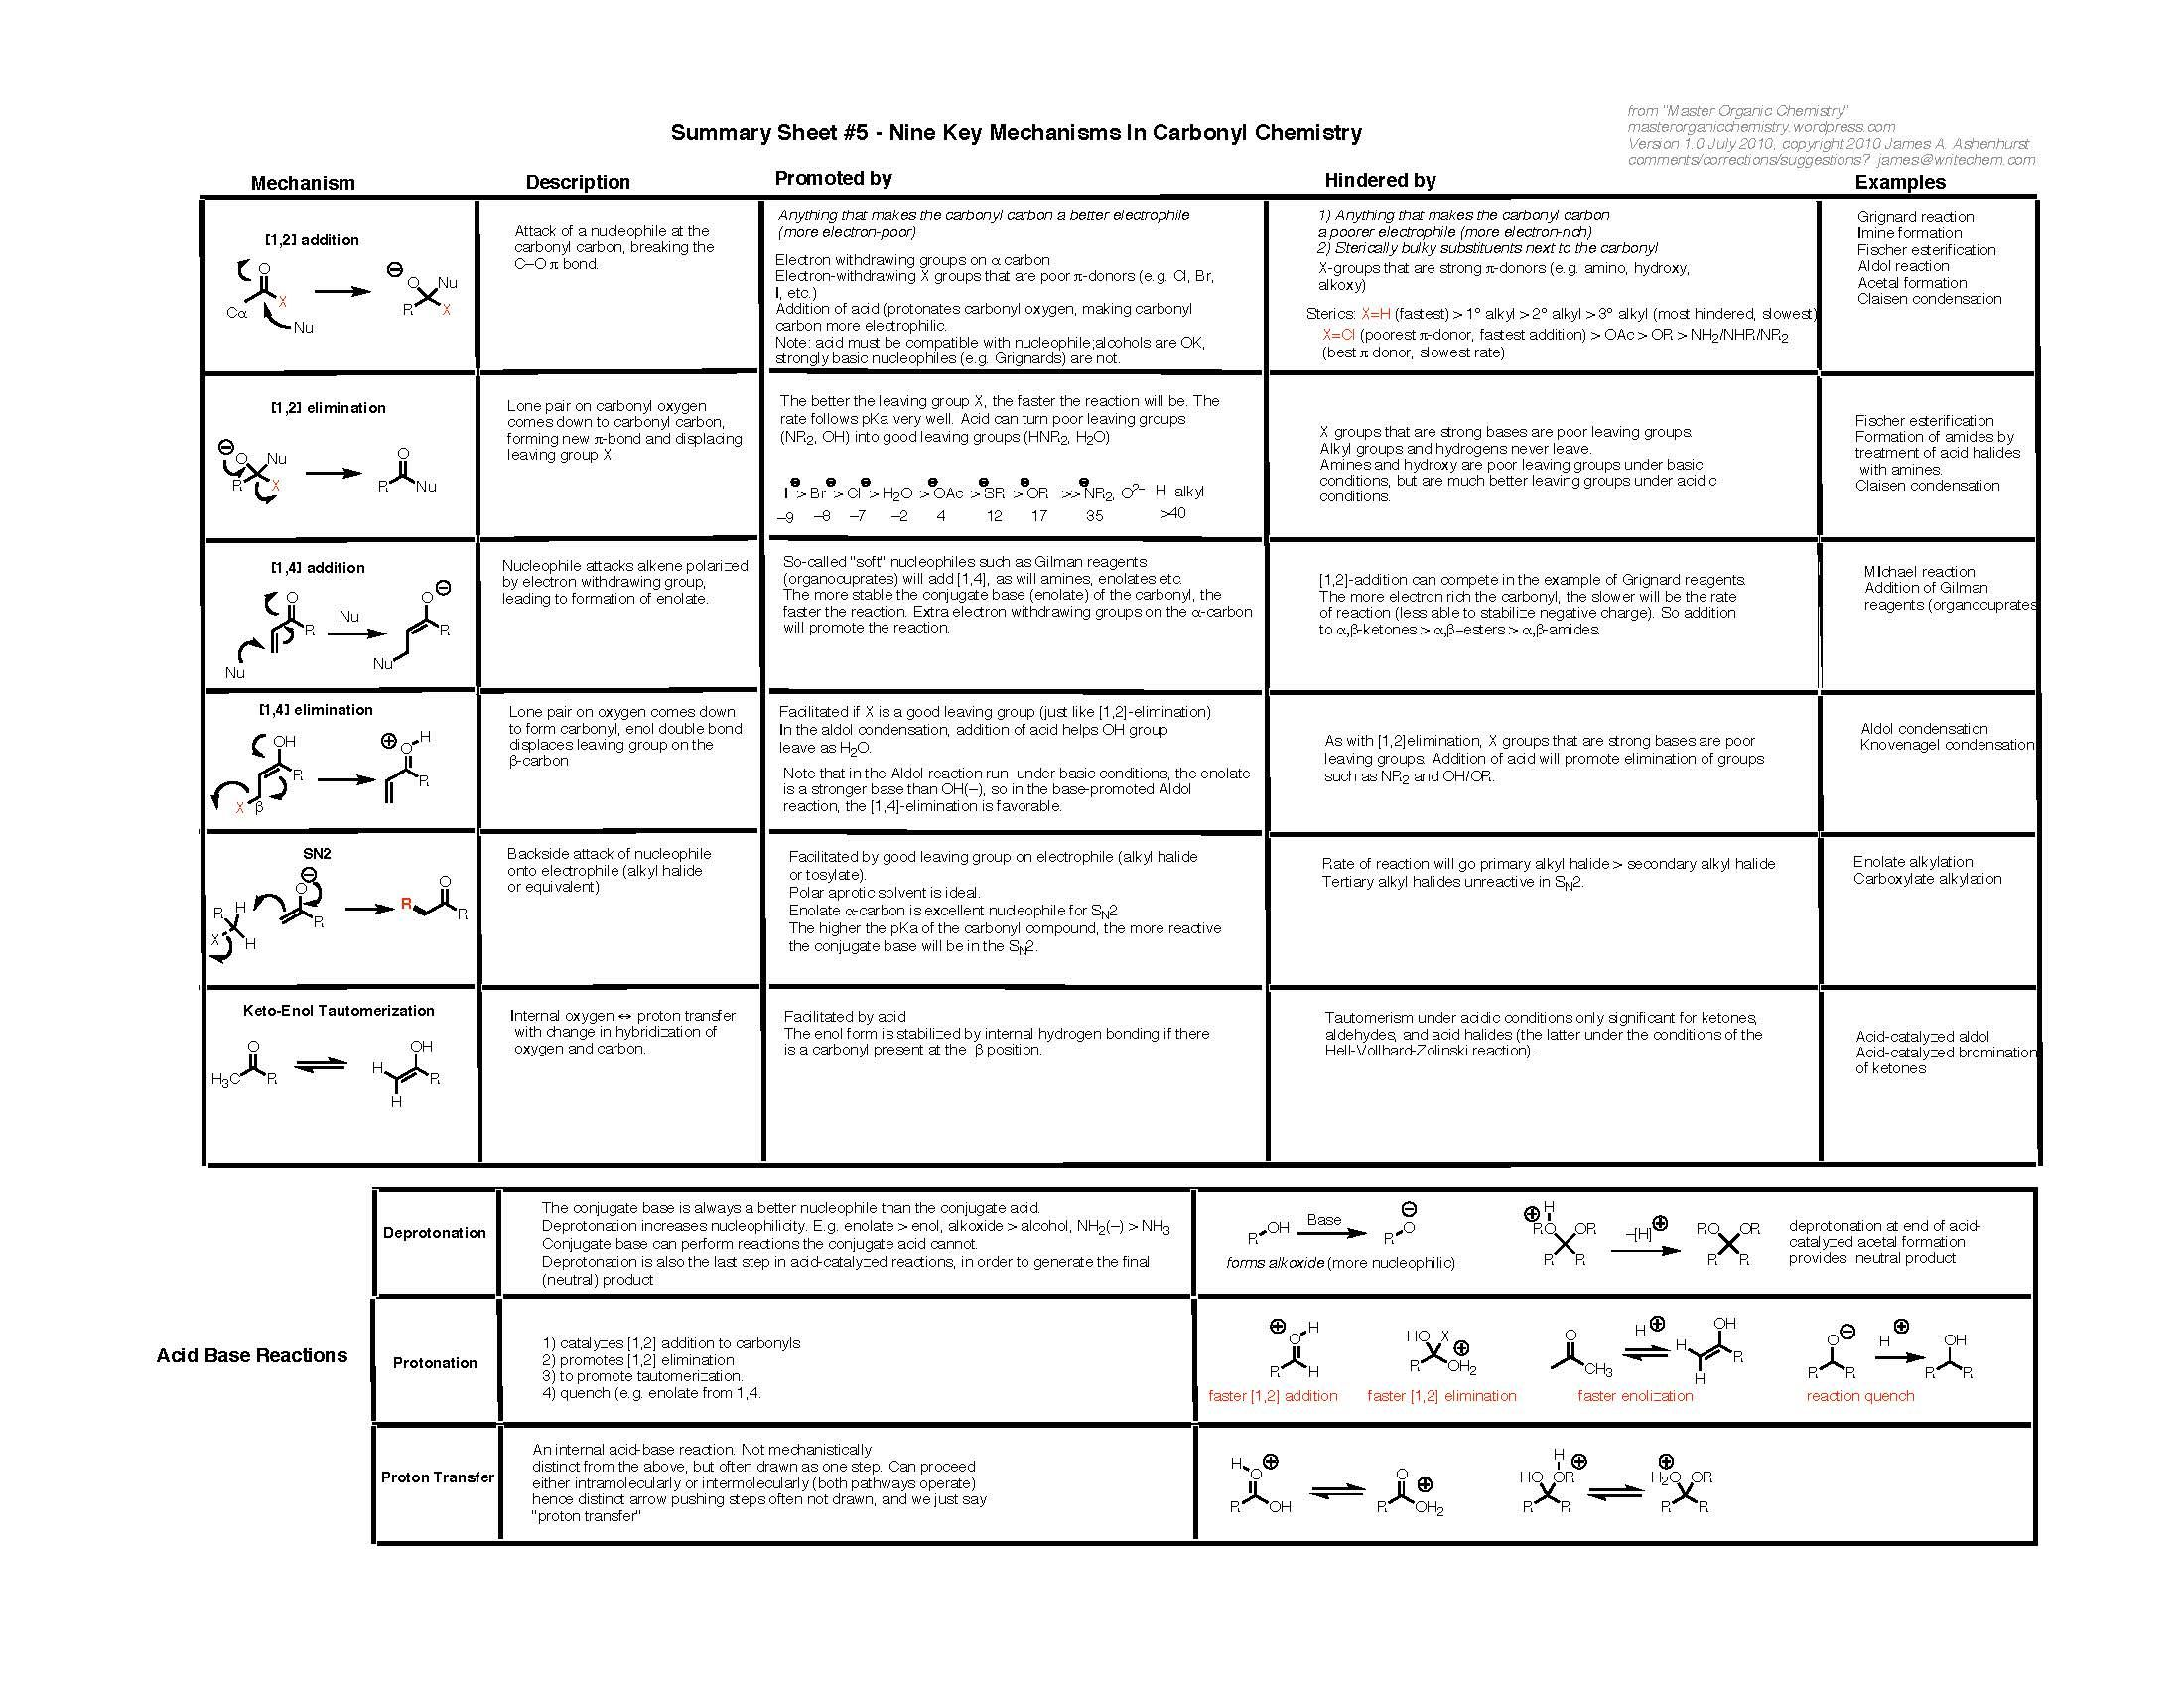 Reactions Reaction Summary Sheet Http Www Masterorganicchemistry Com Chemistry Help Chemistry Organic Chemistry